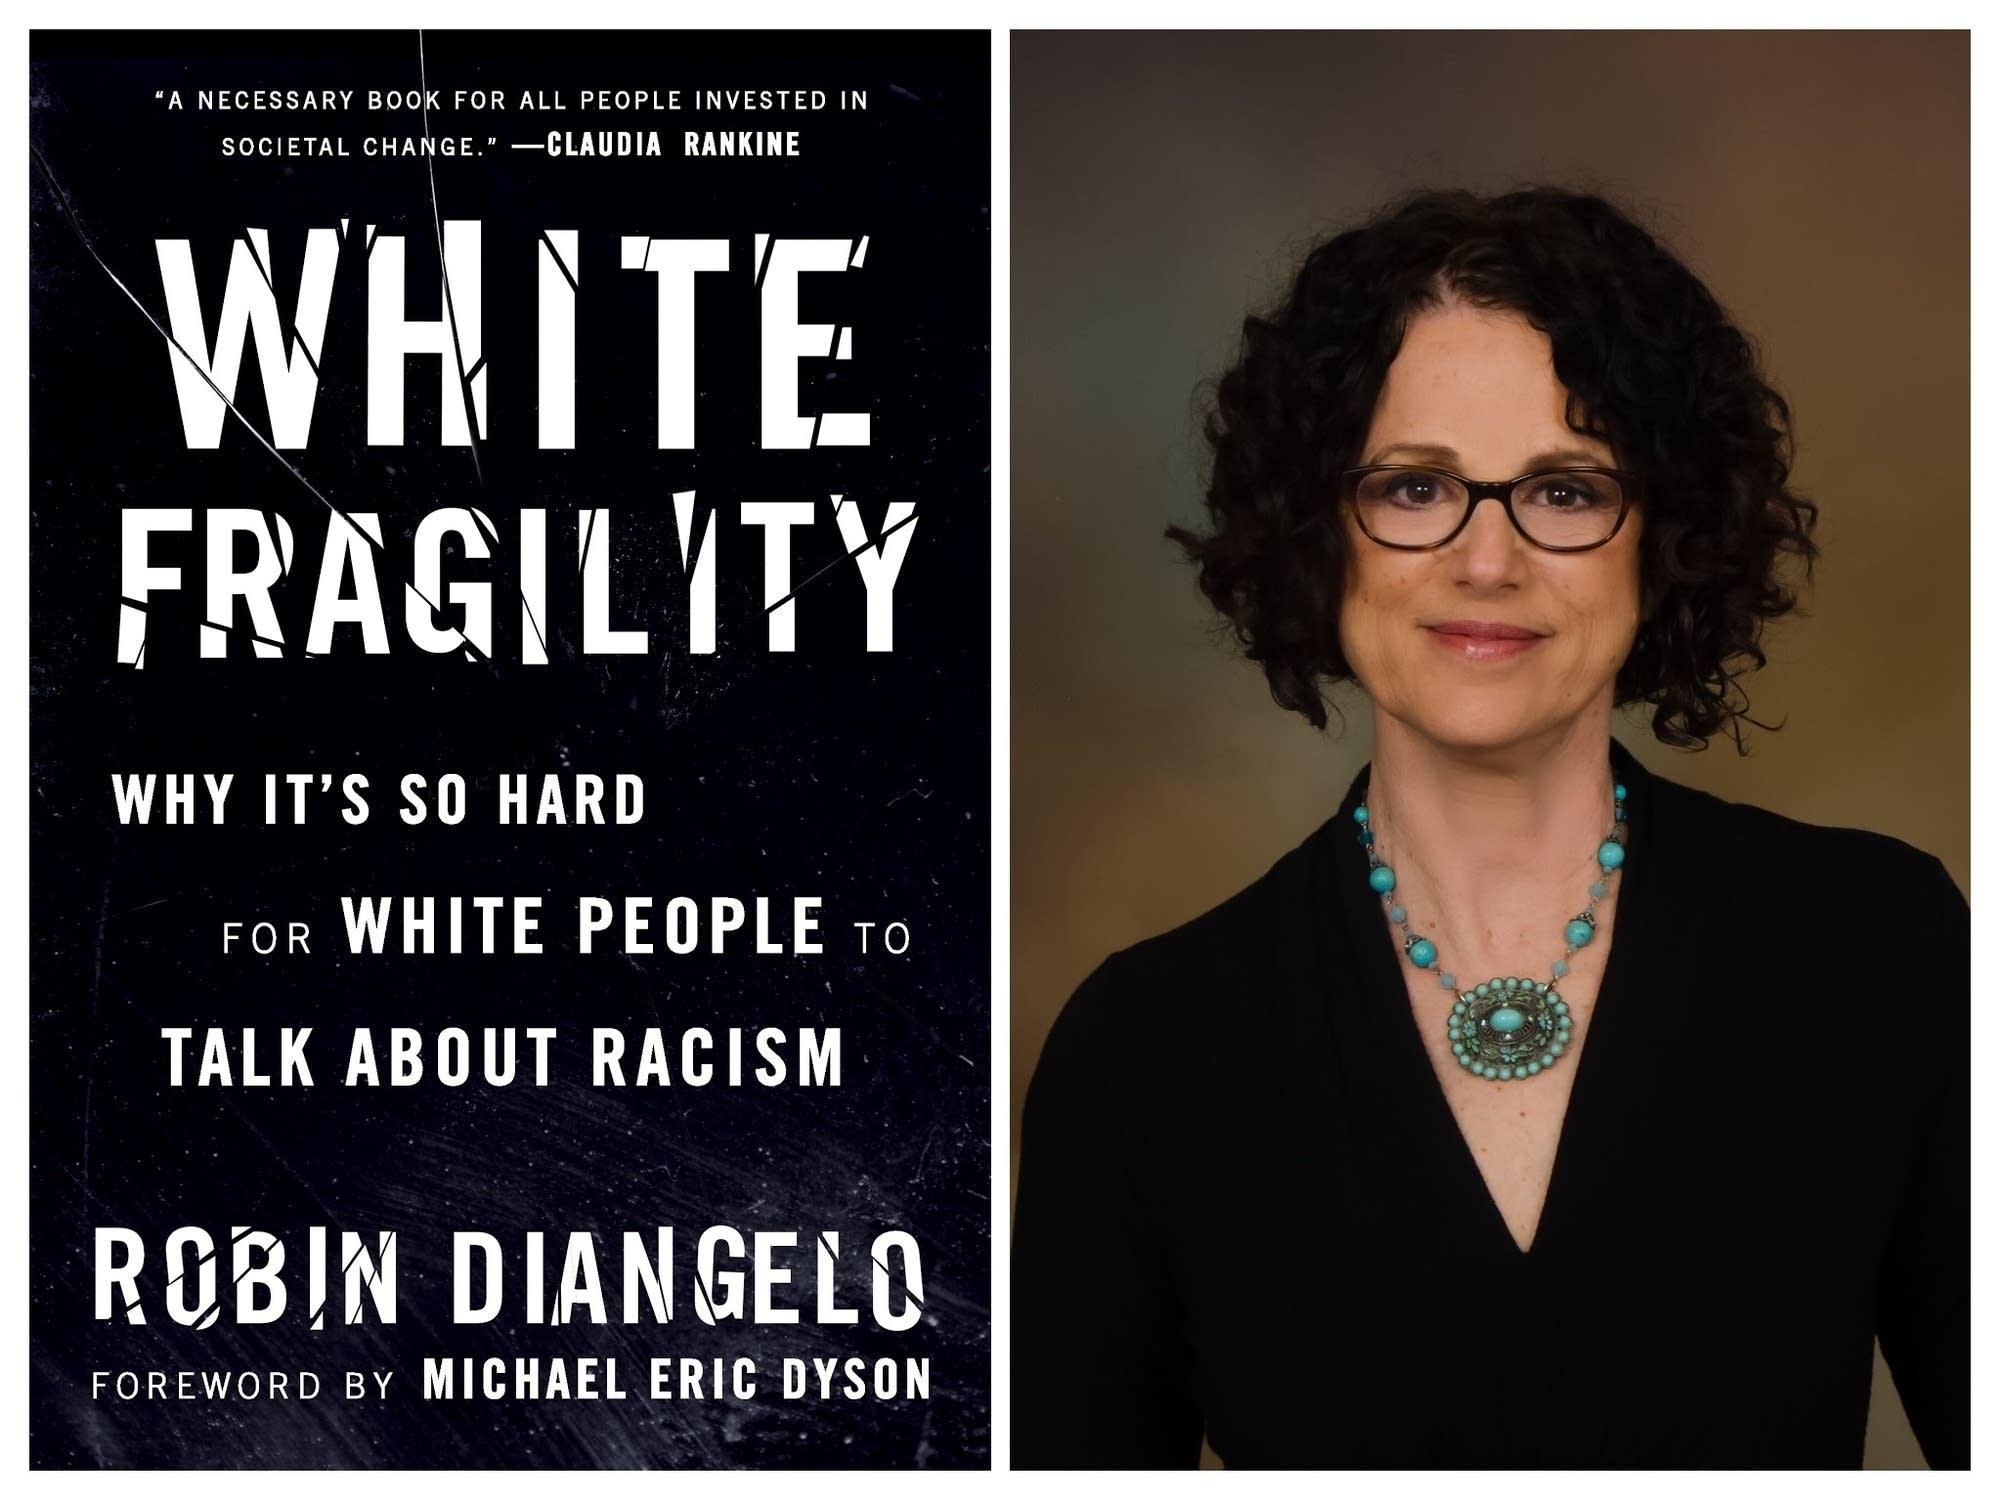 492dfa-20180705-diangelo-whitefragility-2-collage.jpg